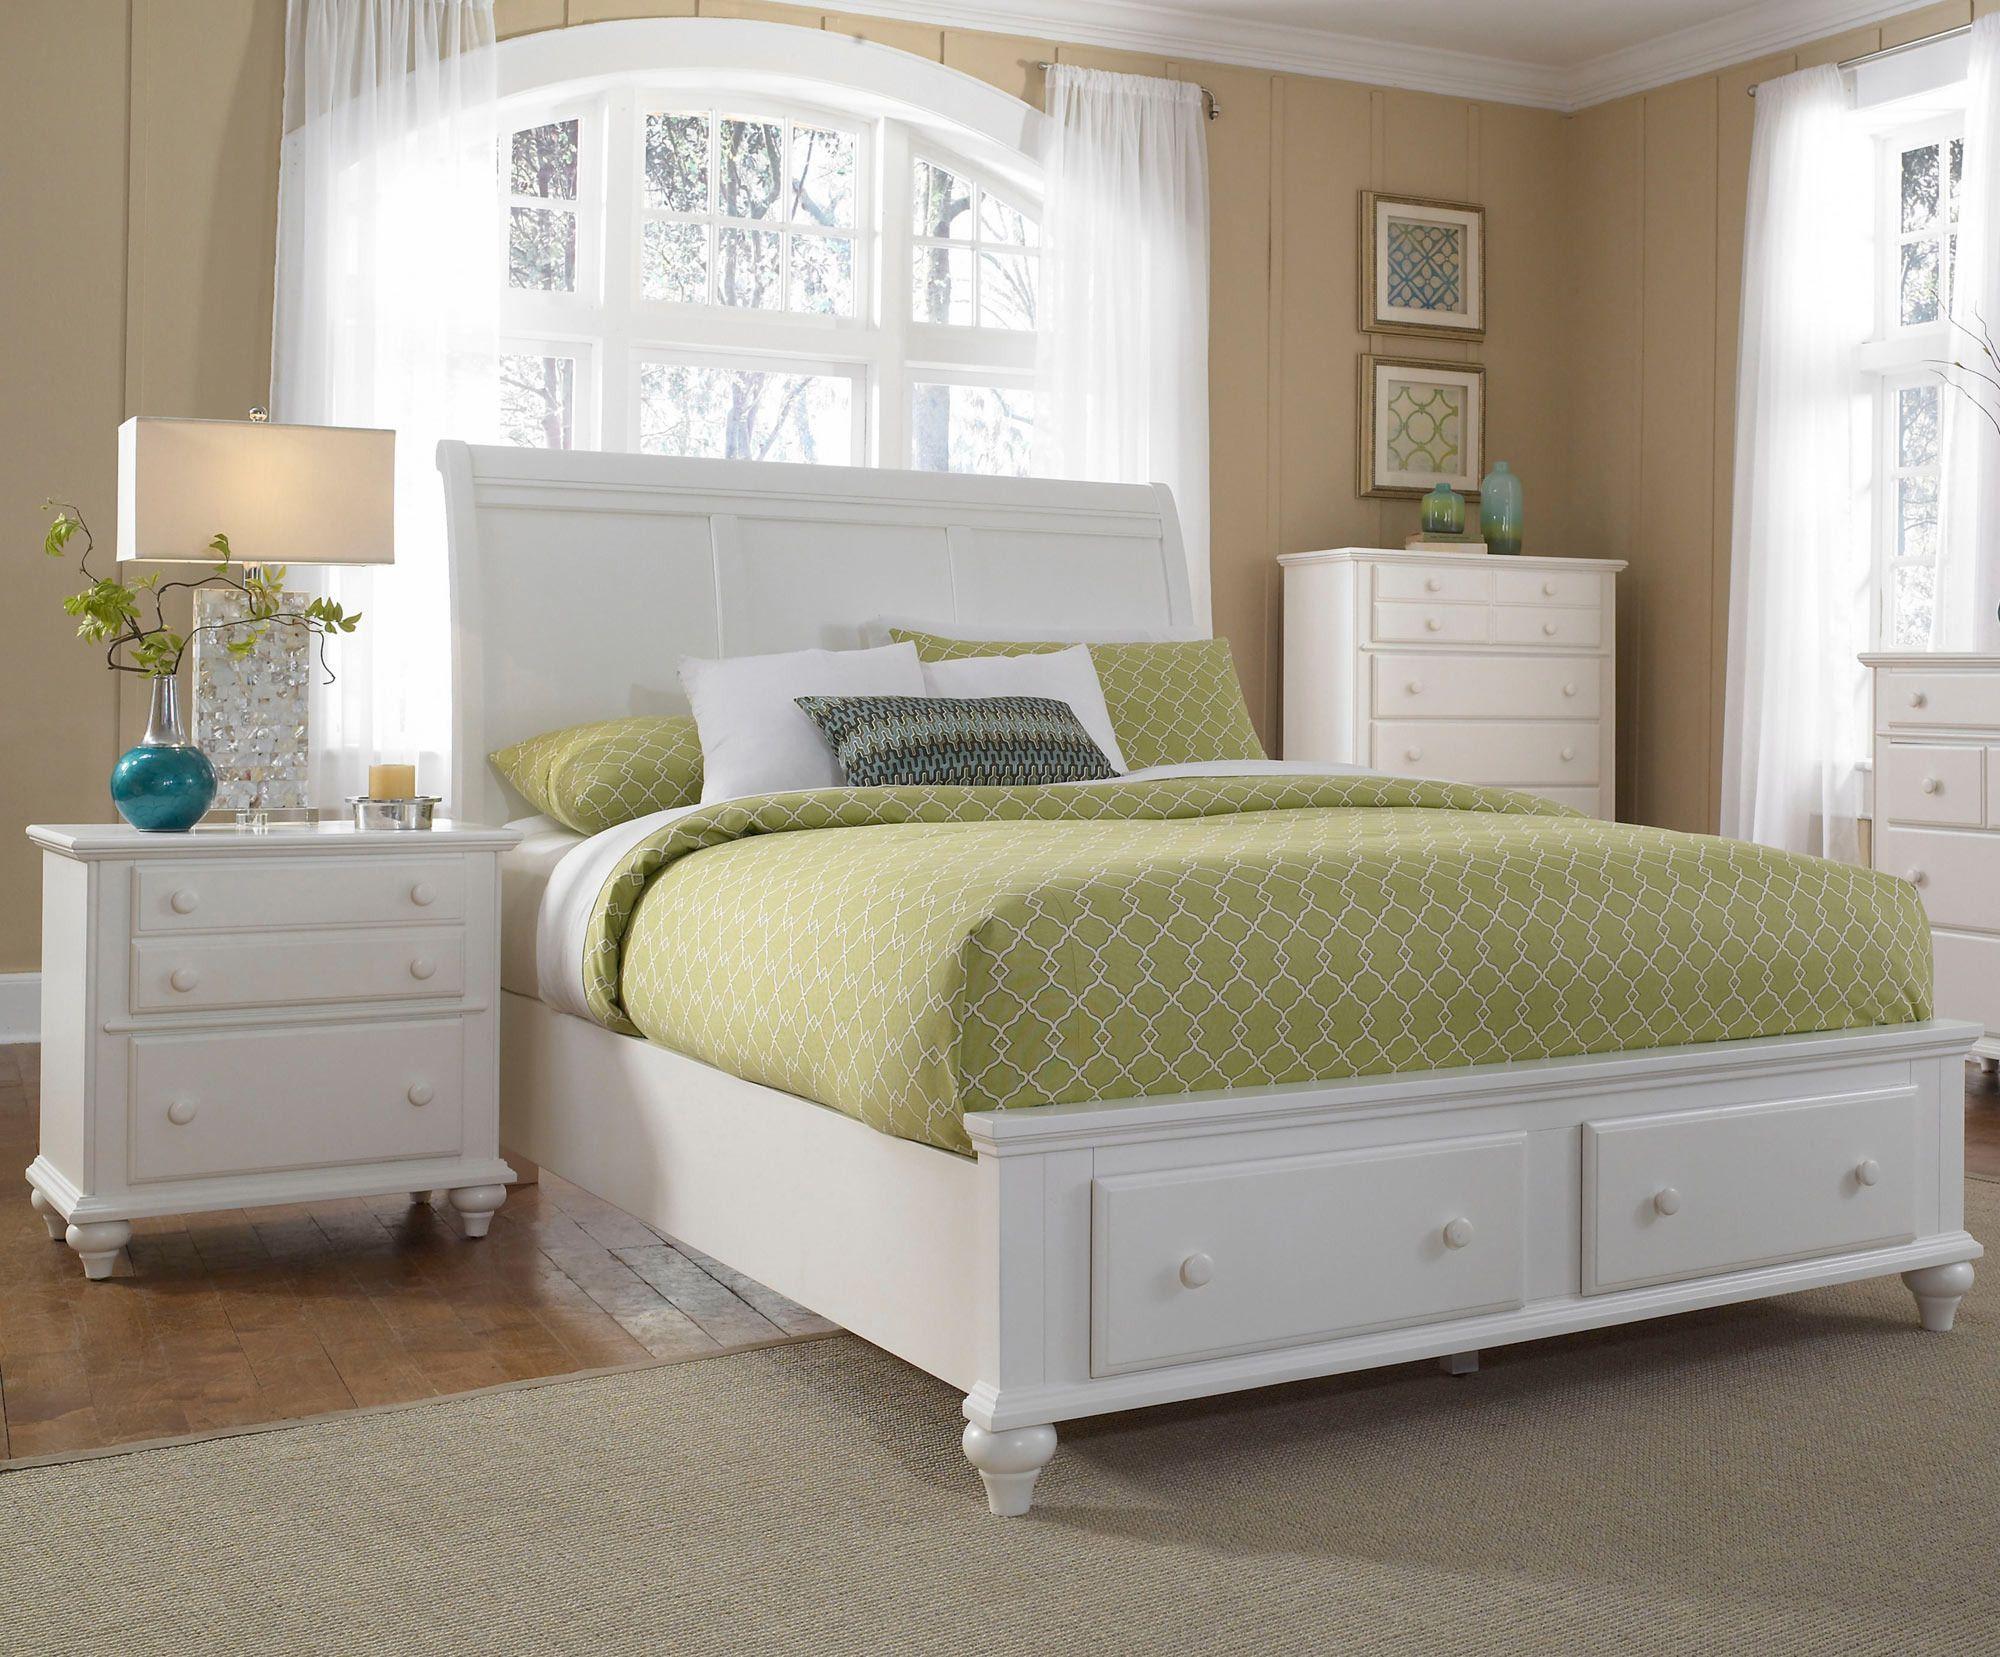 hayden place sleigh storage bedroom set in white by broyhill home rh pinterest com